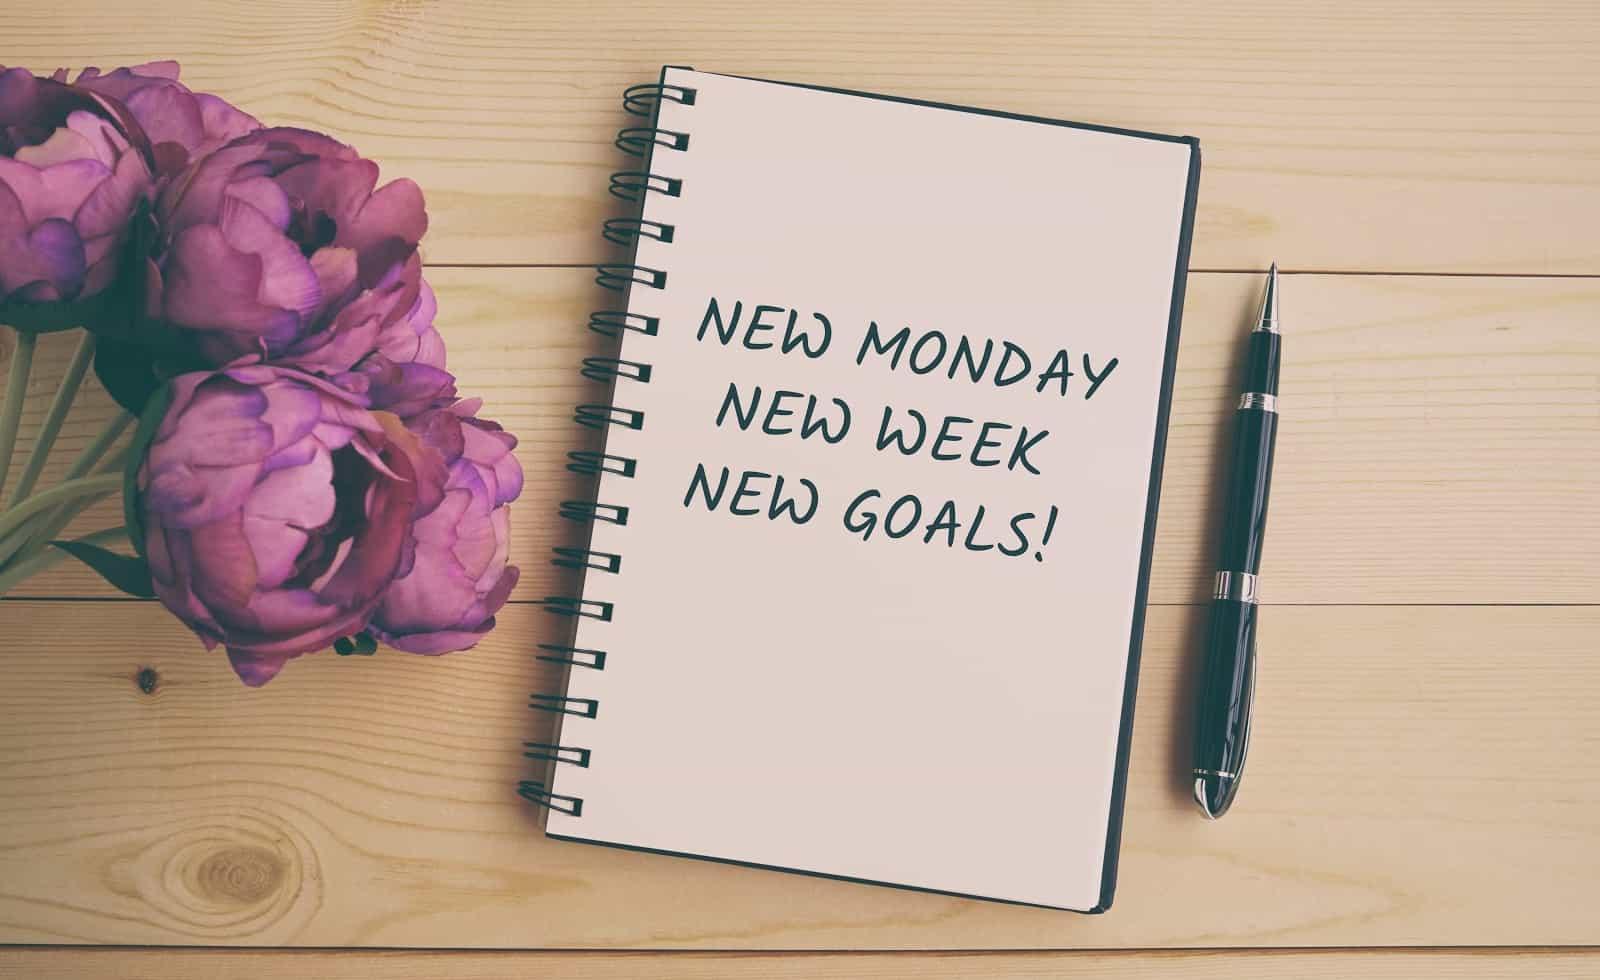 New Monday, New Week, New Goals